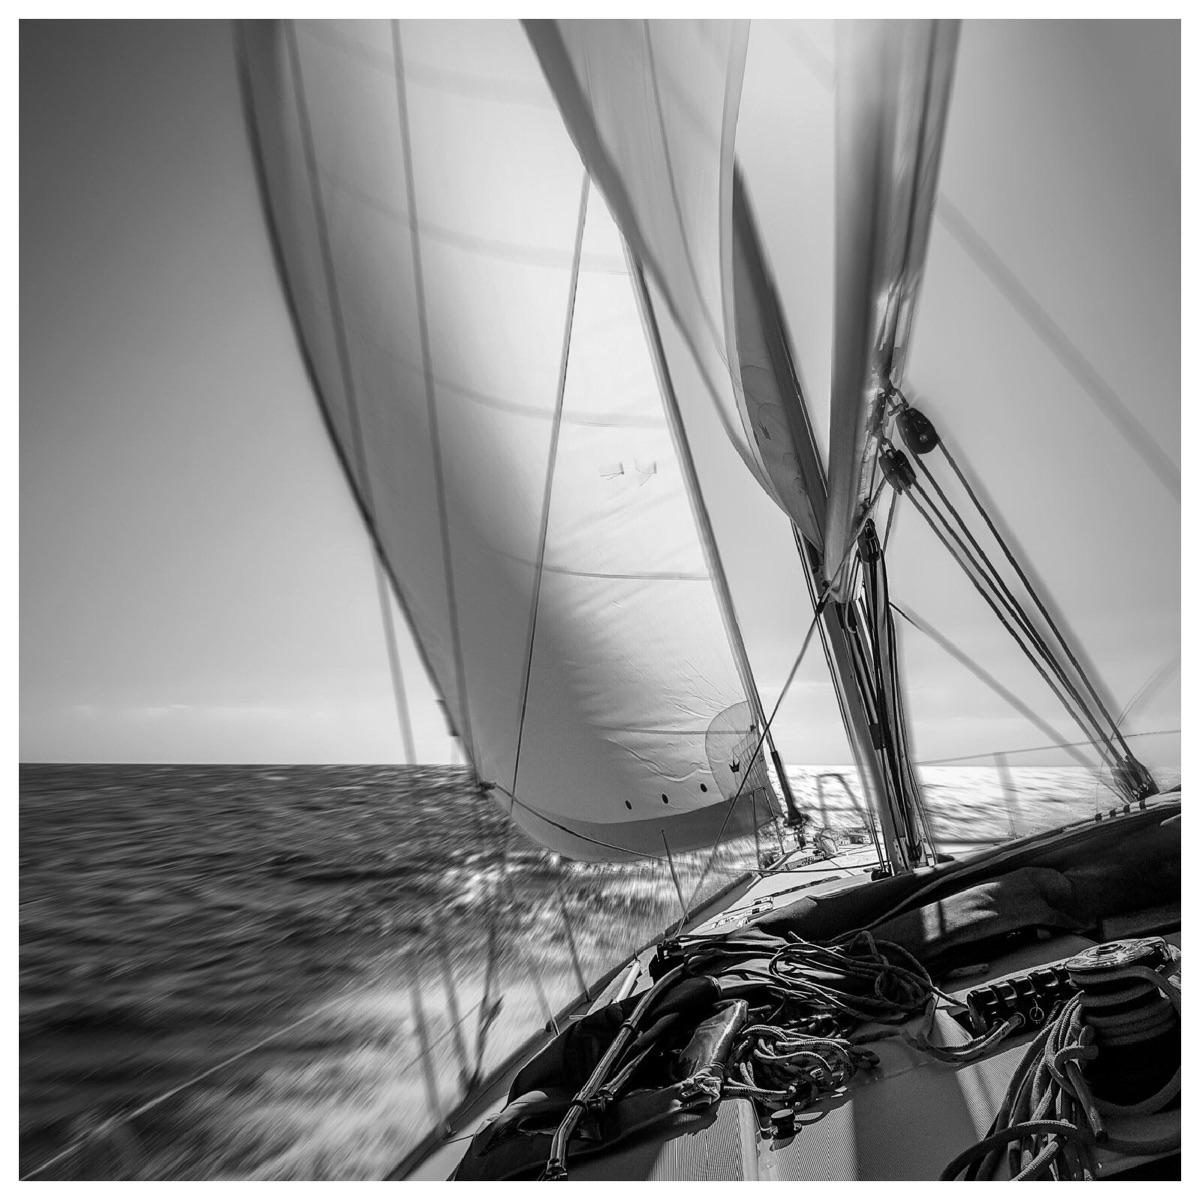 Sails unfurled series Série Voi - murielleetc | ello